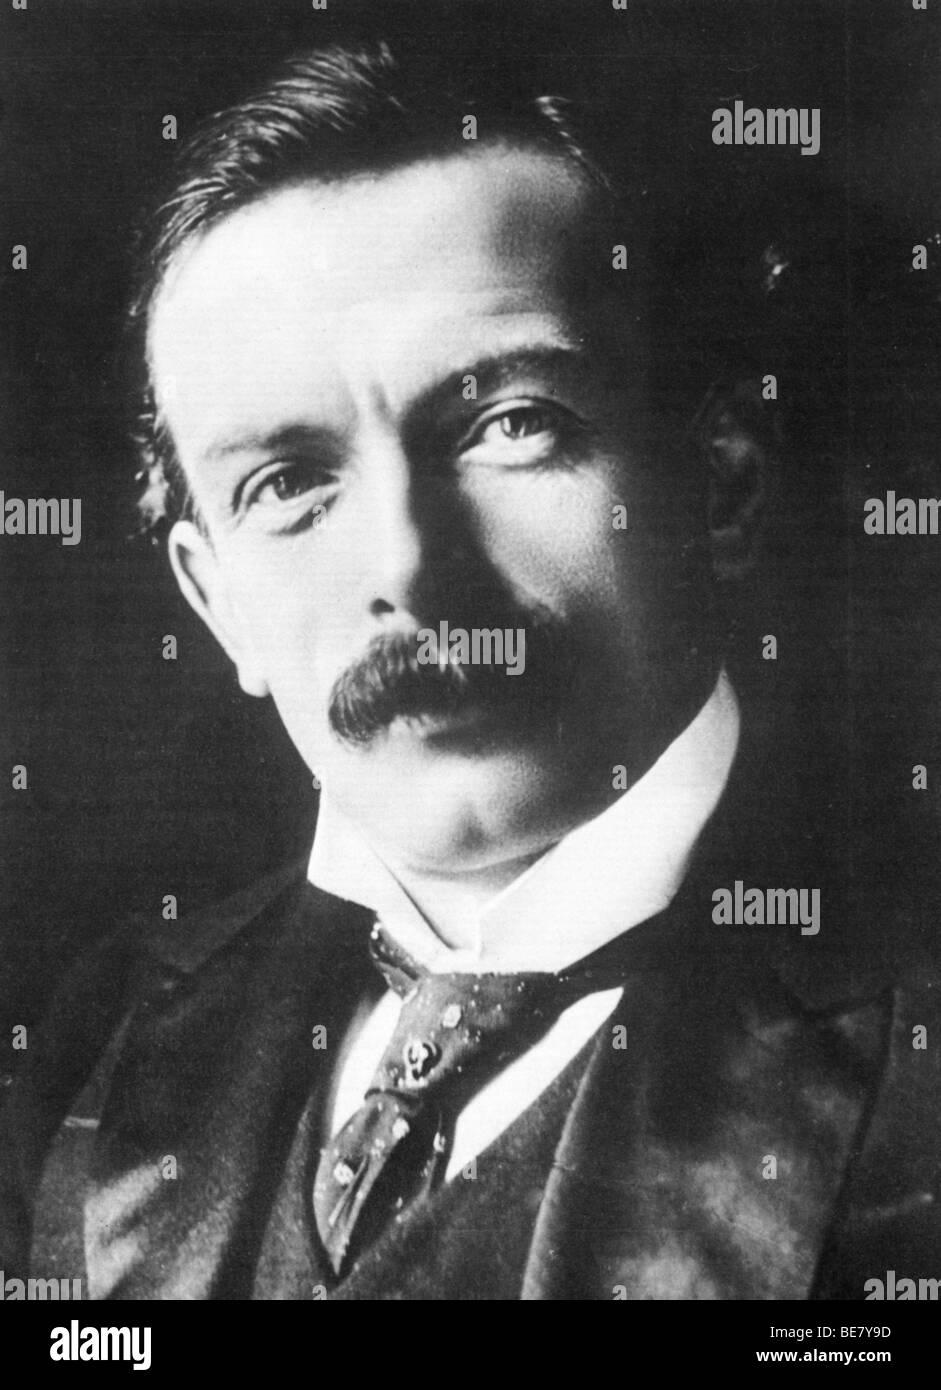 DAVID Lloyd George - gallese statista liberale (1863-1945) Immagini Stock